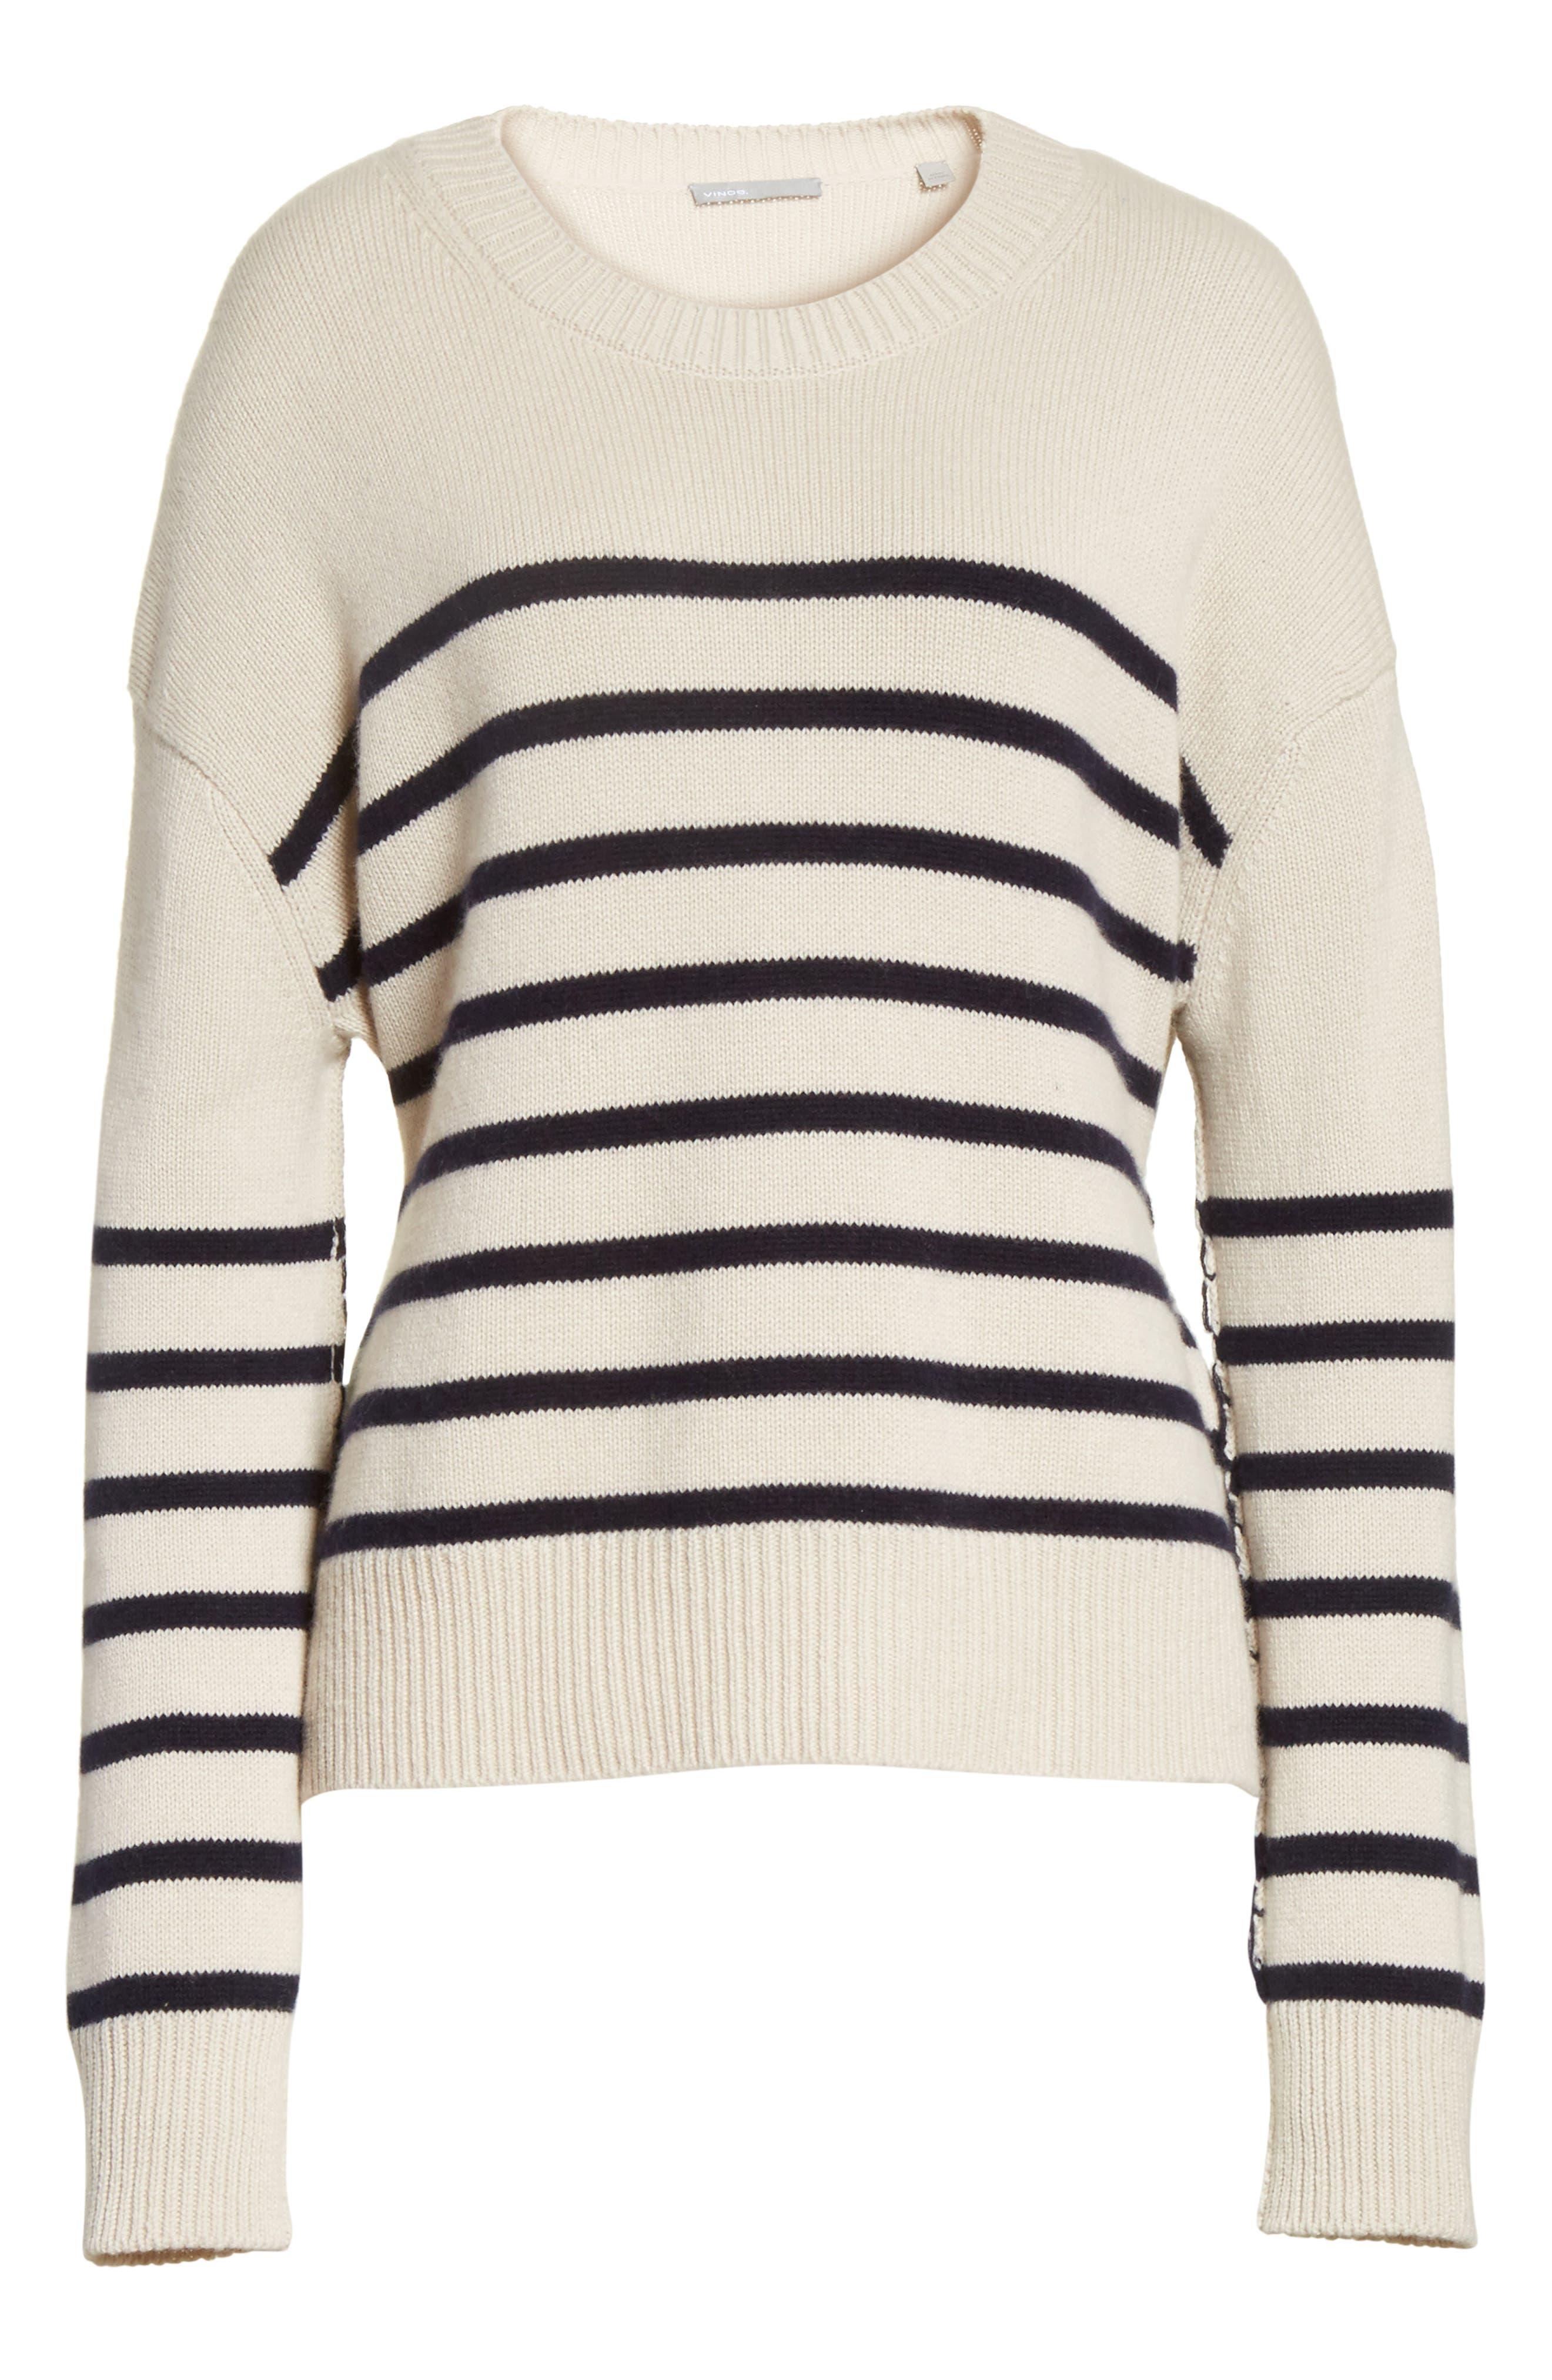 Cashmere Stripe Boxy Crew Sweater,                             Alternate thumbnail 6, color,                             Chalet/ Coastal